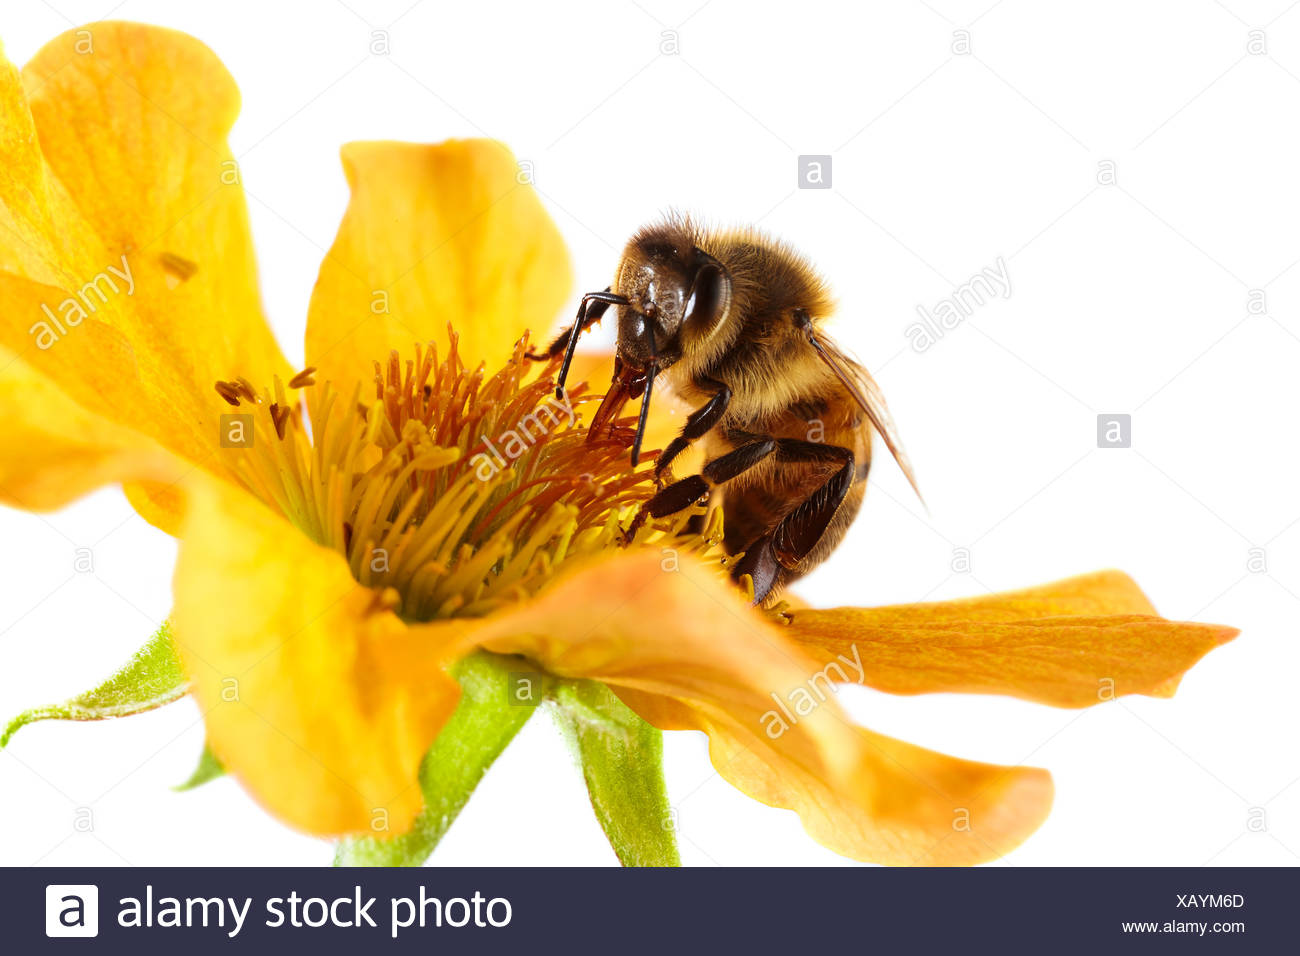 Honey bee on a flower Stock Photo